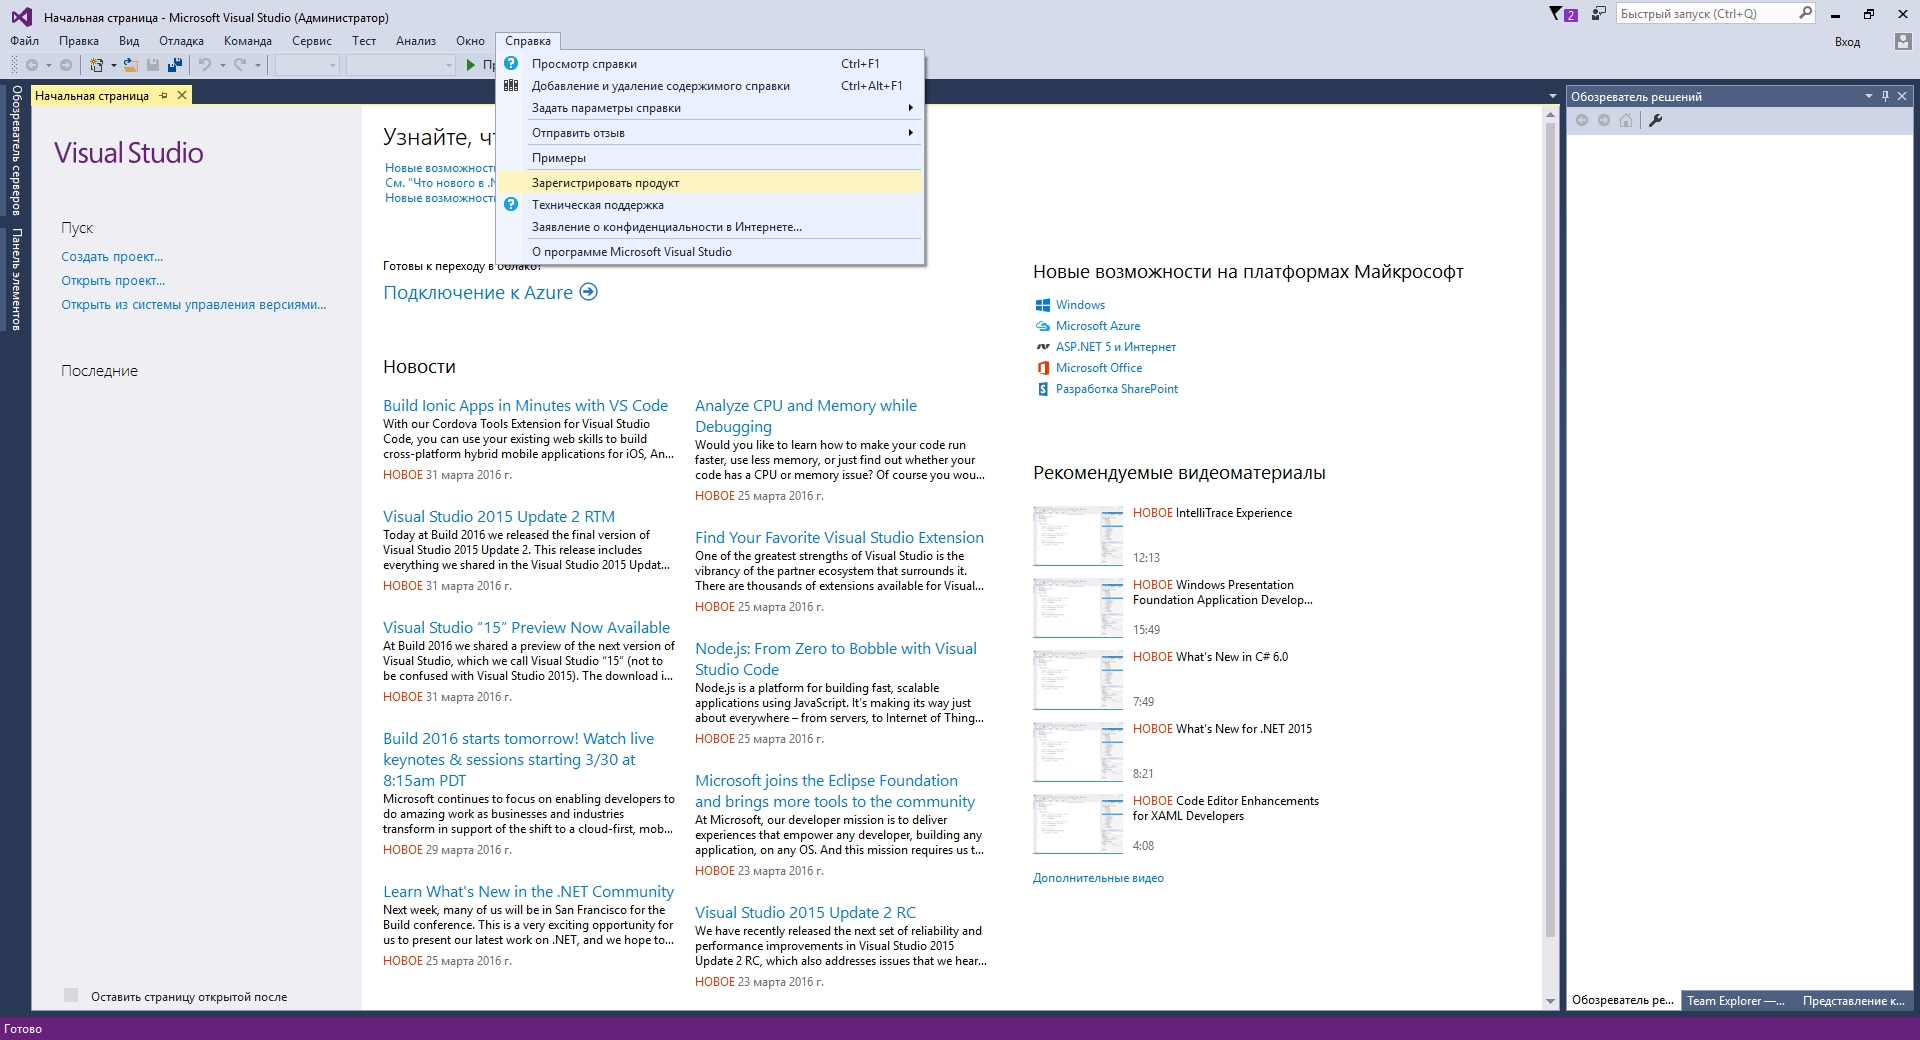 Microsoft Visual Studio 2015 14 0 25123 00 Update 2 Professional x86